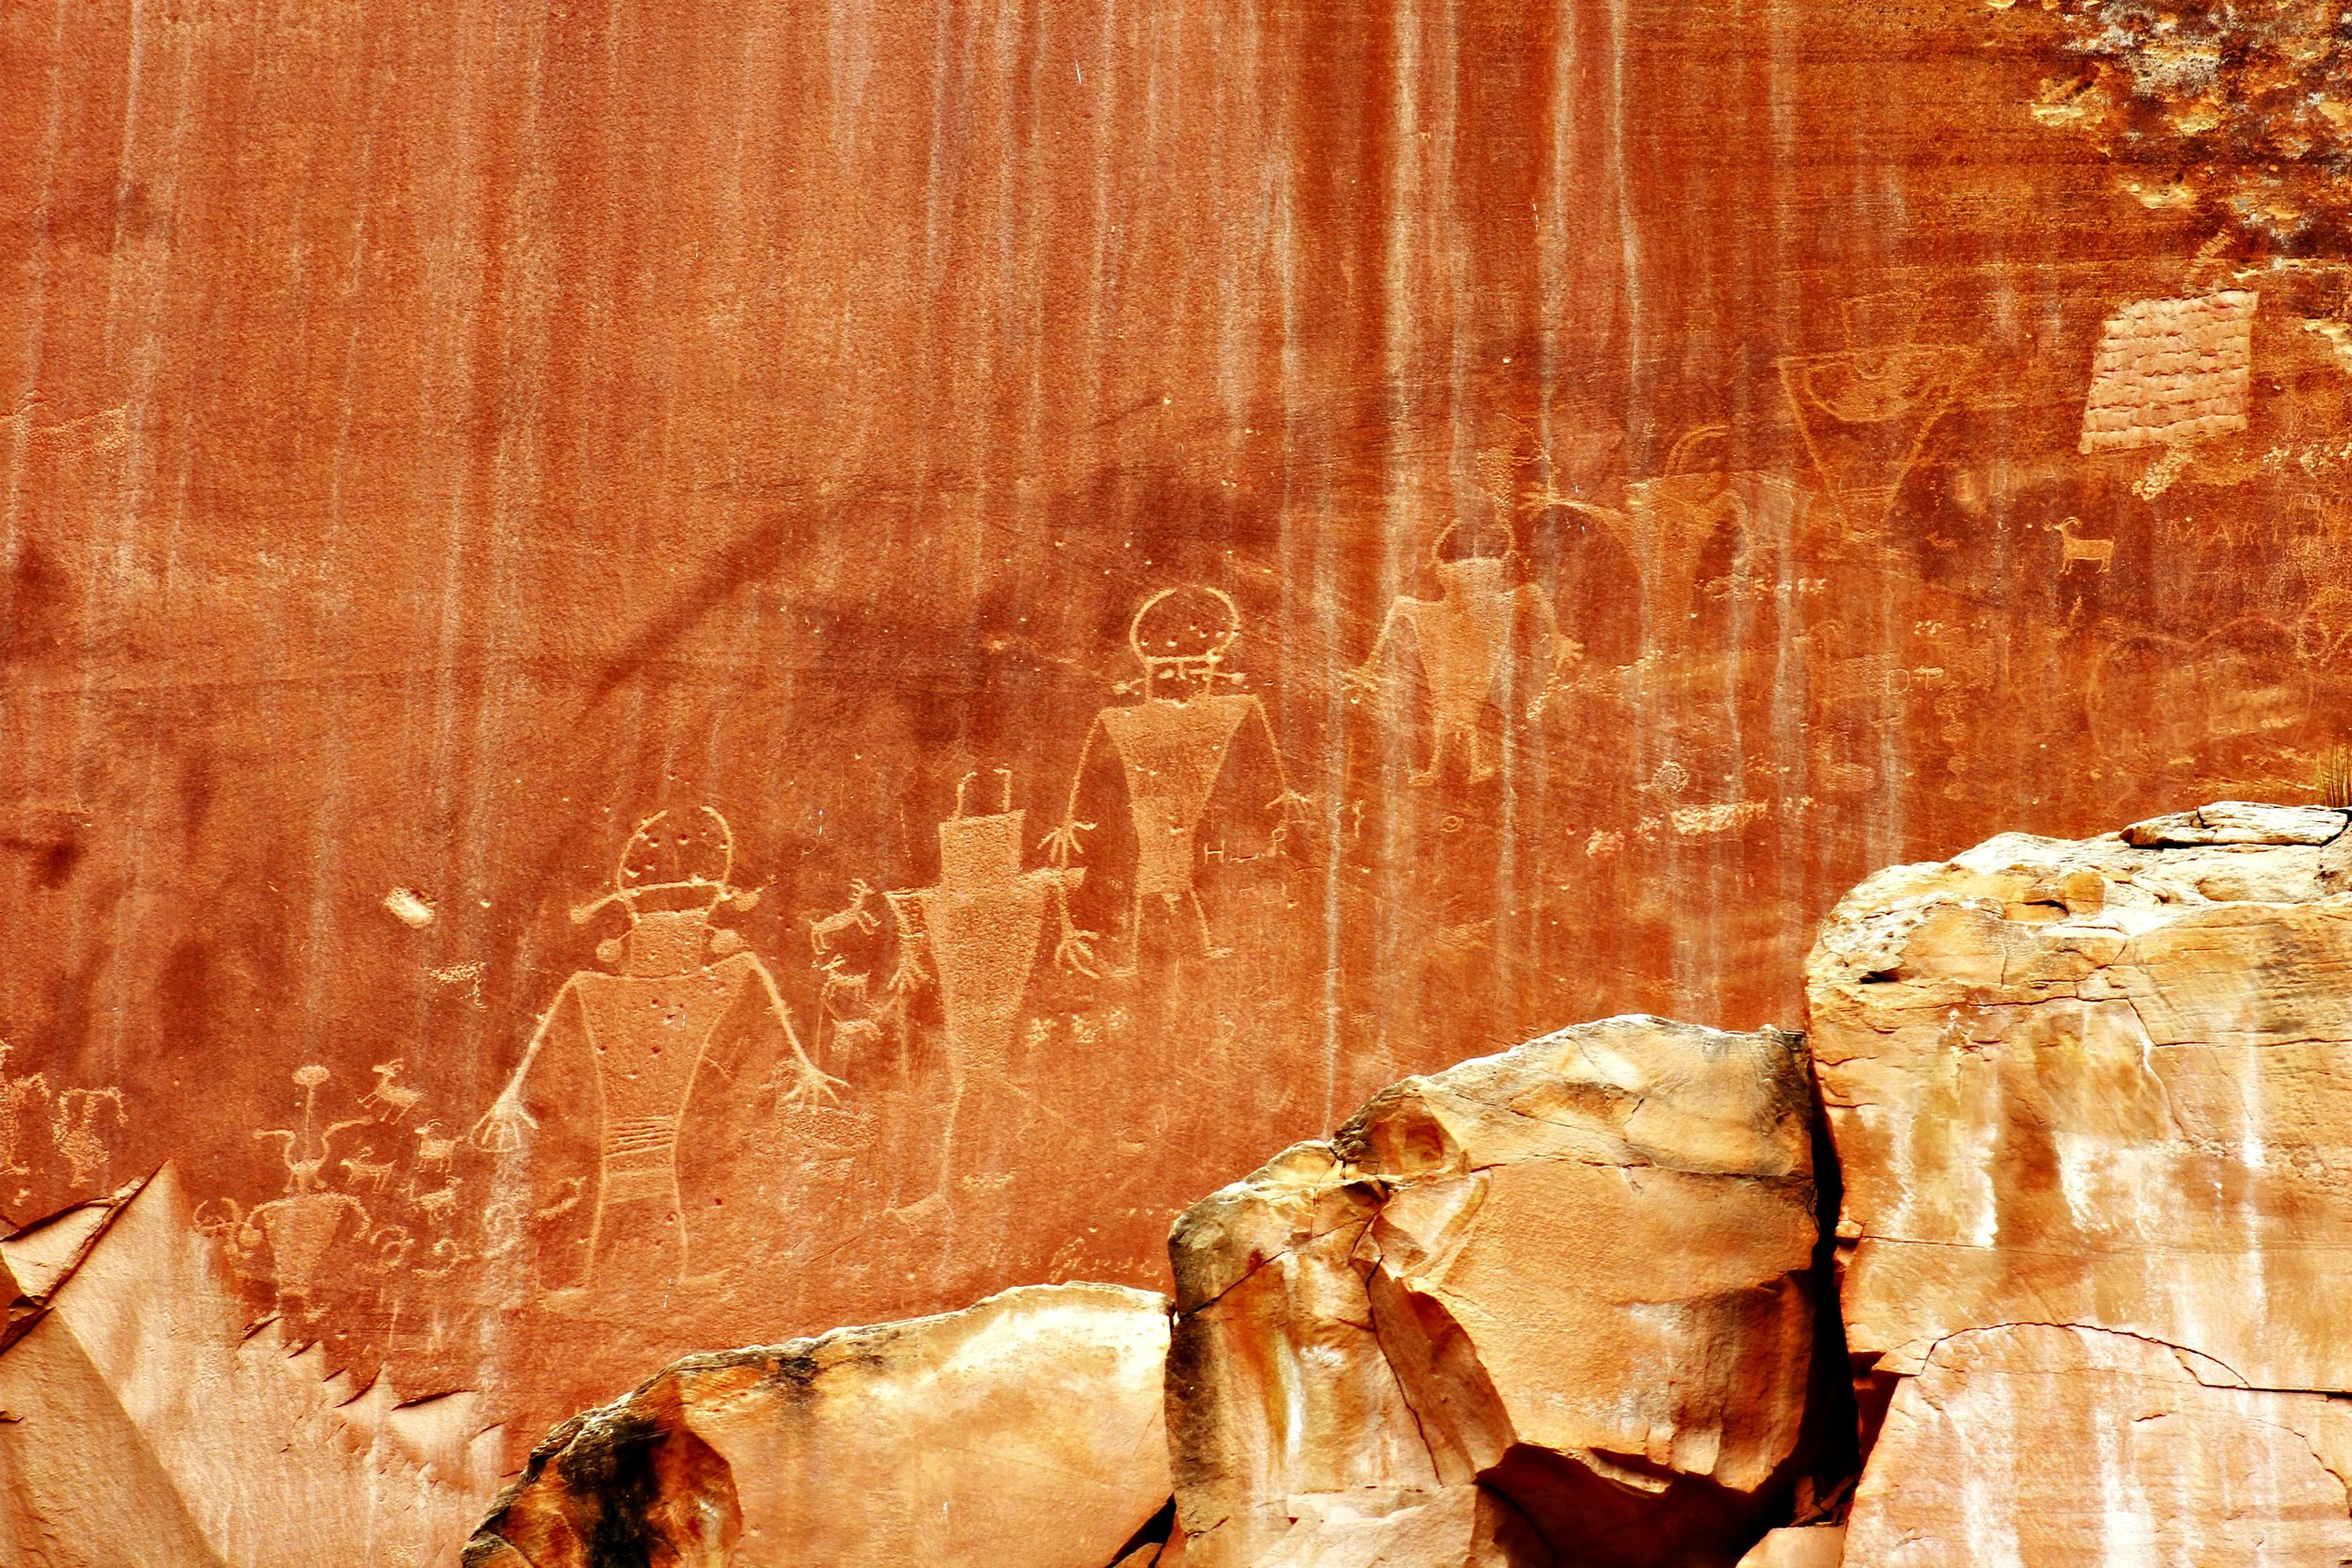 petroglyphs-capitol-reef-national-park-sites-kids